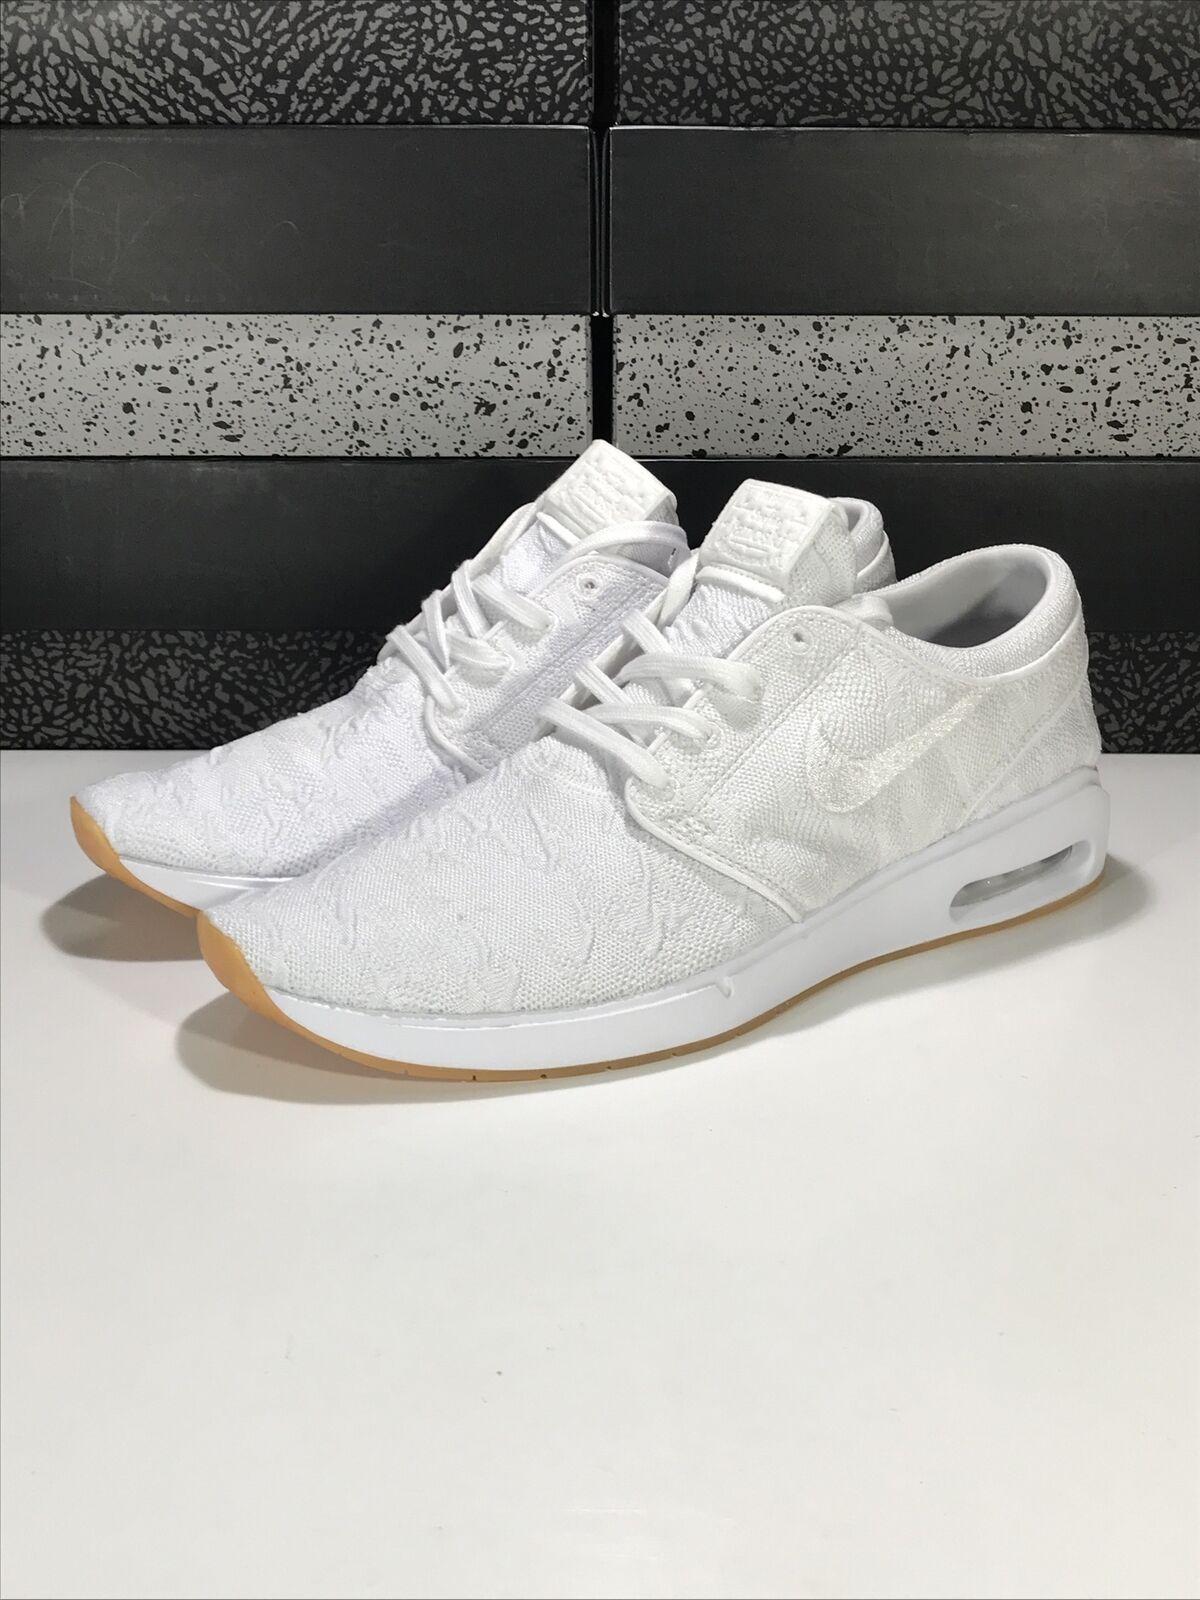 Size 12 - Nike SB Air Max Stefan Janoski 2 White Gum 2019 for sale ...